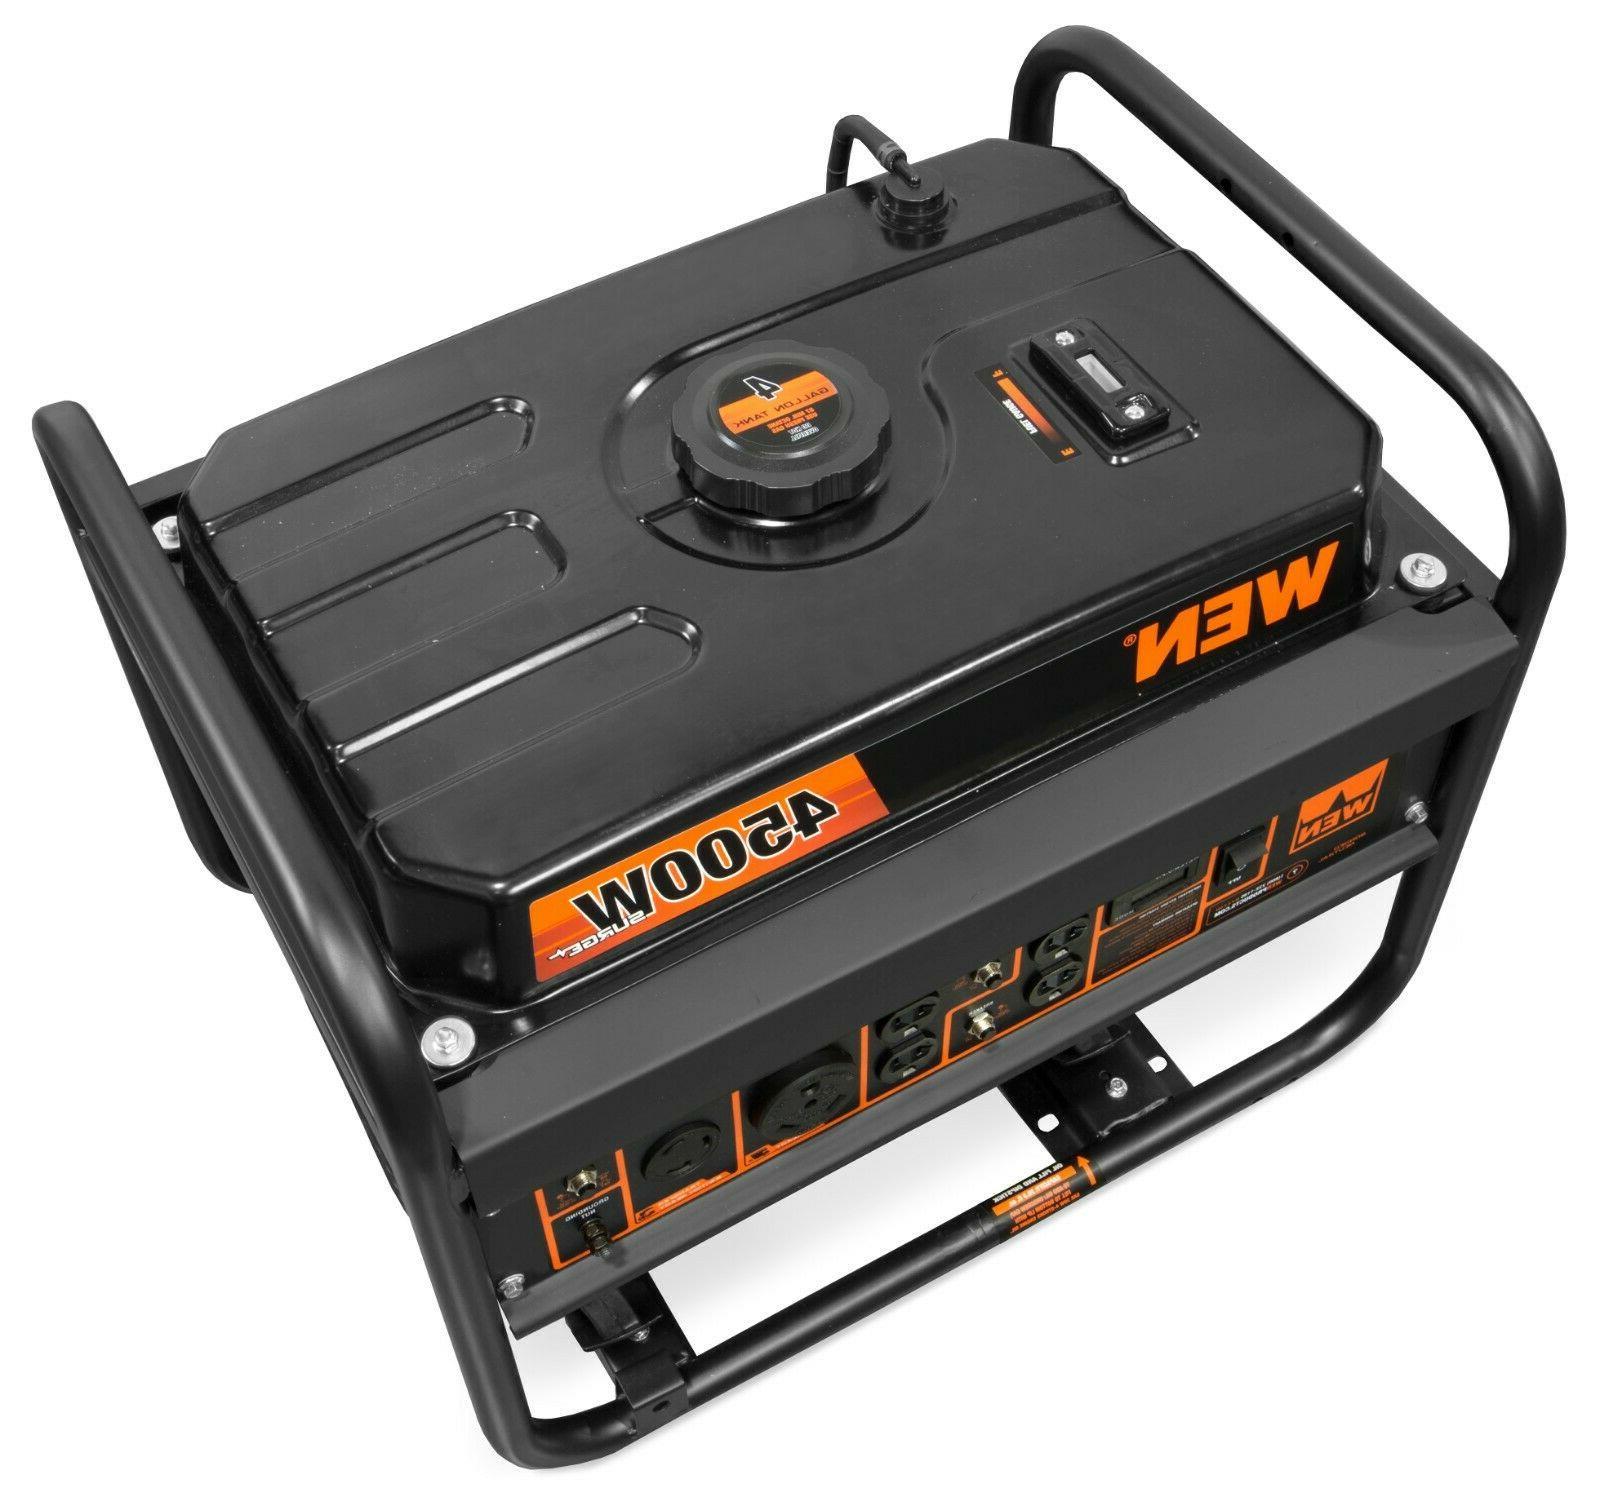 WEN GN4500 4500-Watt 212cc Transfer and Portable